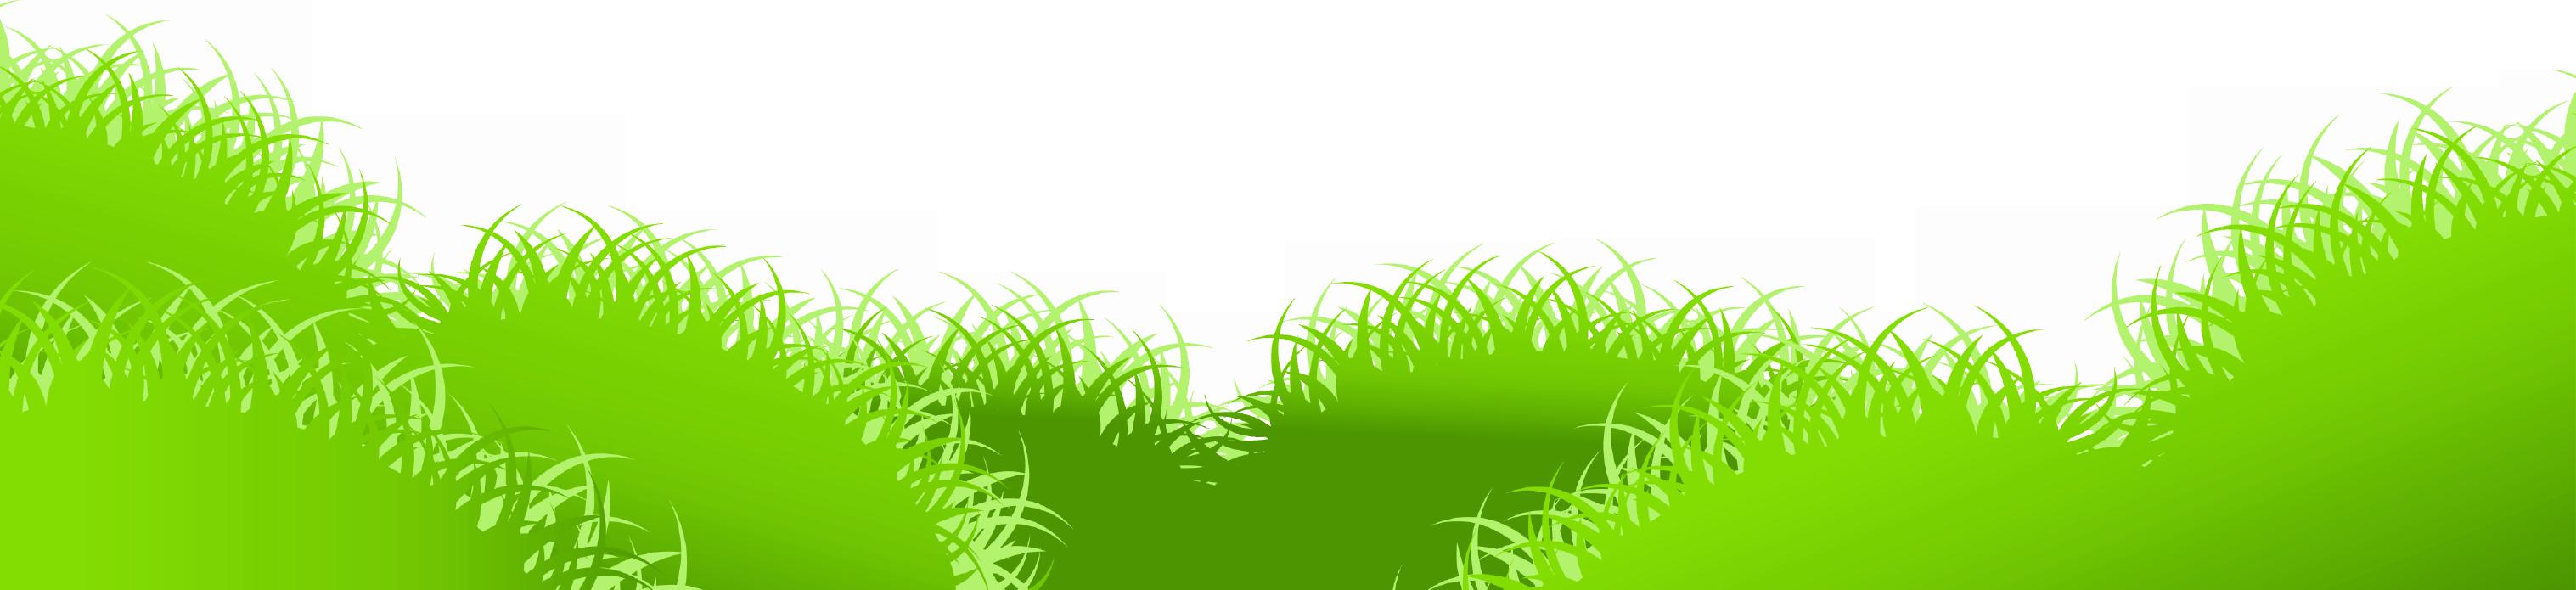 Free Grass Cliparts, Download Free Clip Art, Free Clip Art.